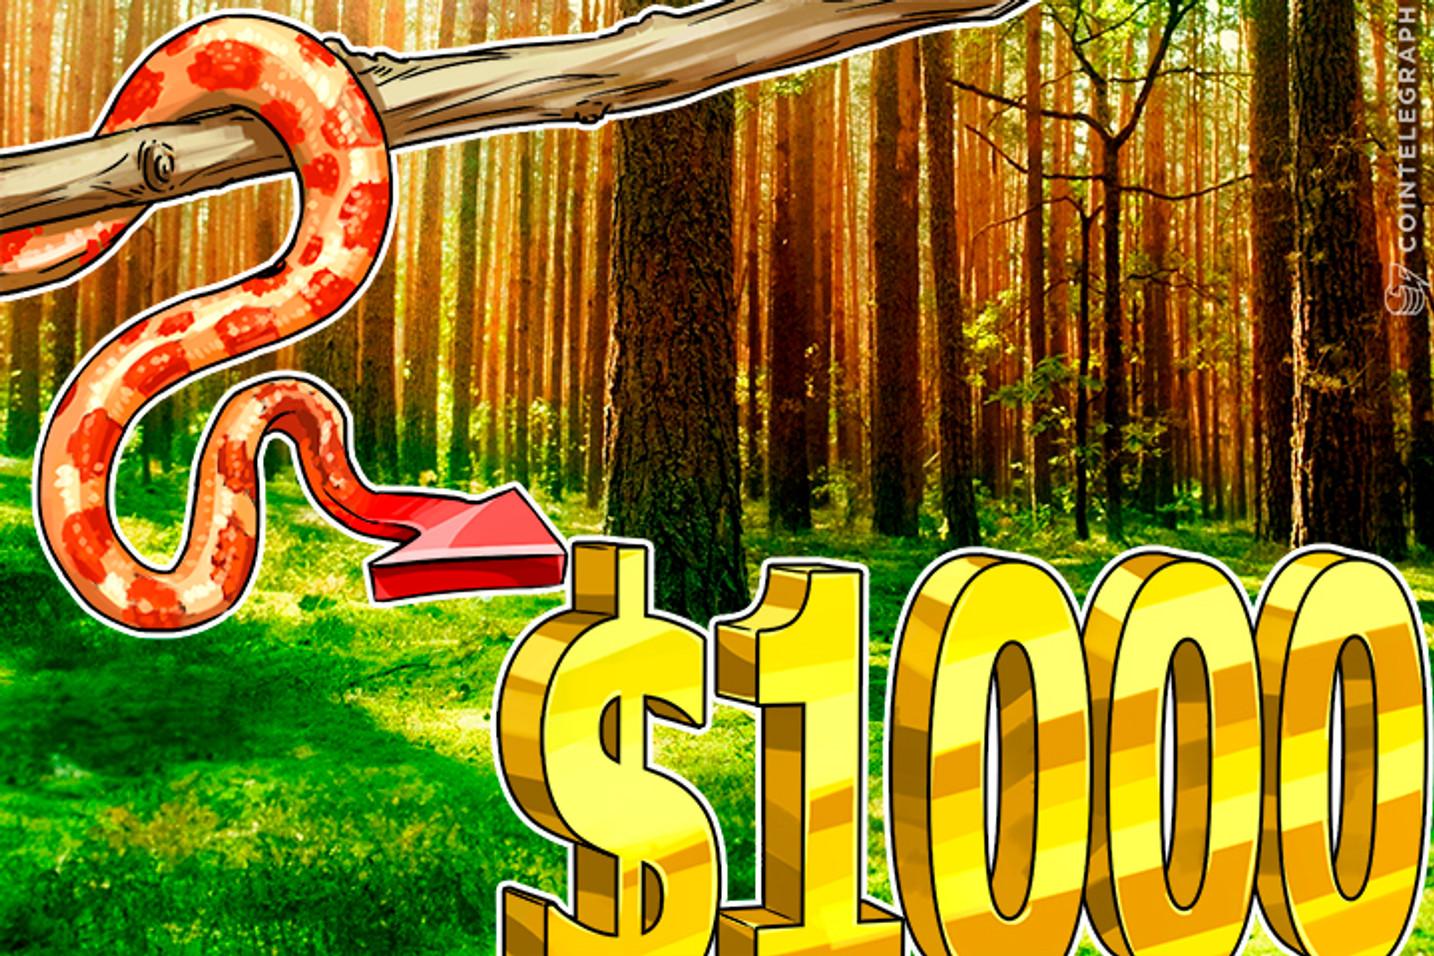 Bitcoin Price Climbs Closer to $1000 As More Bitcoin Going US Way